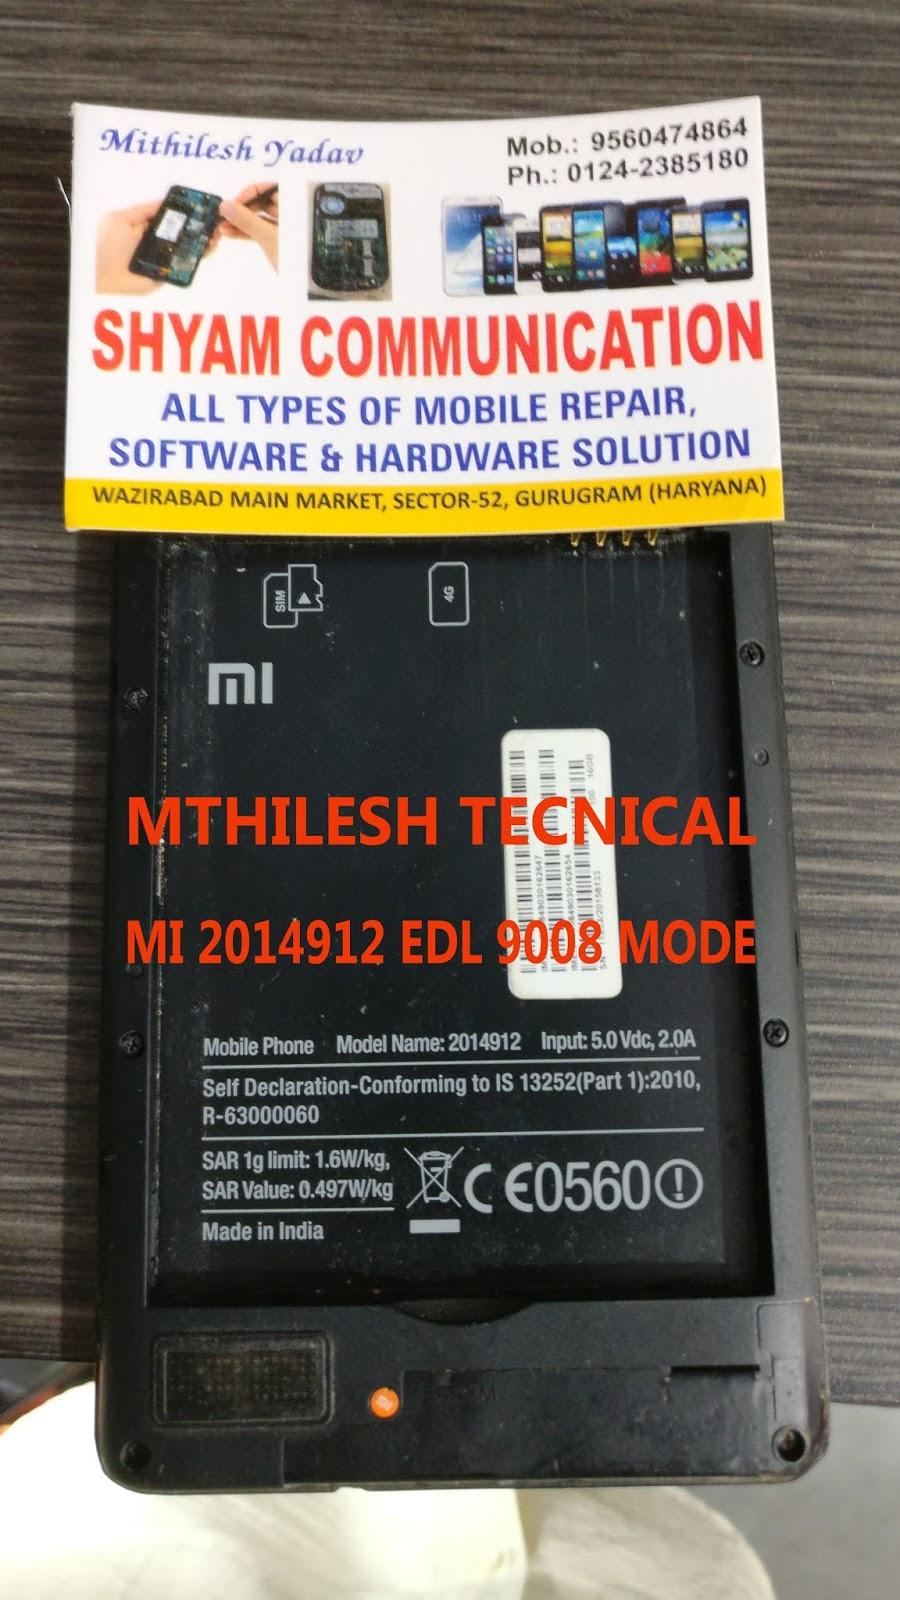 Samsung 9008 Mode